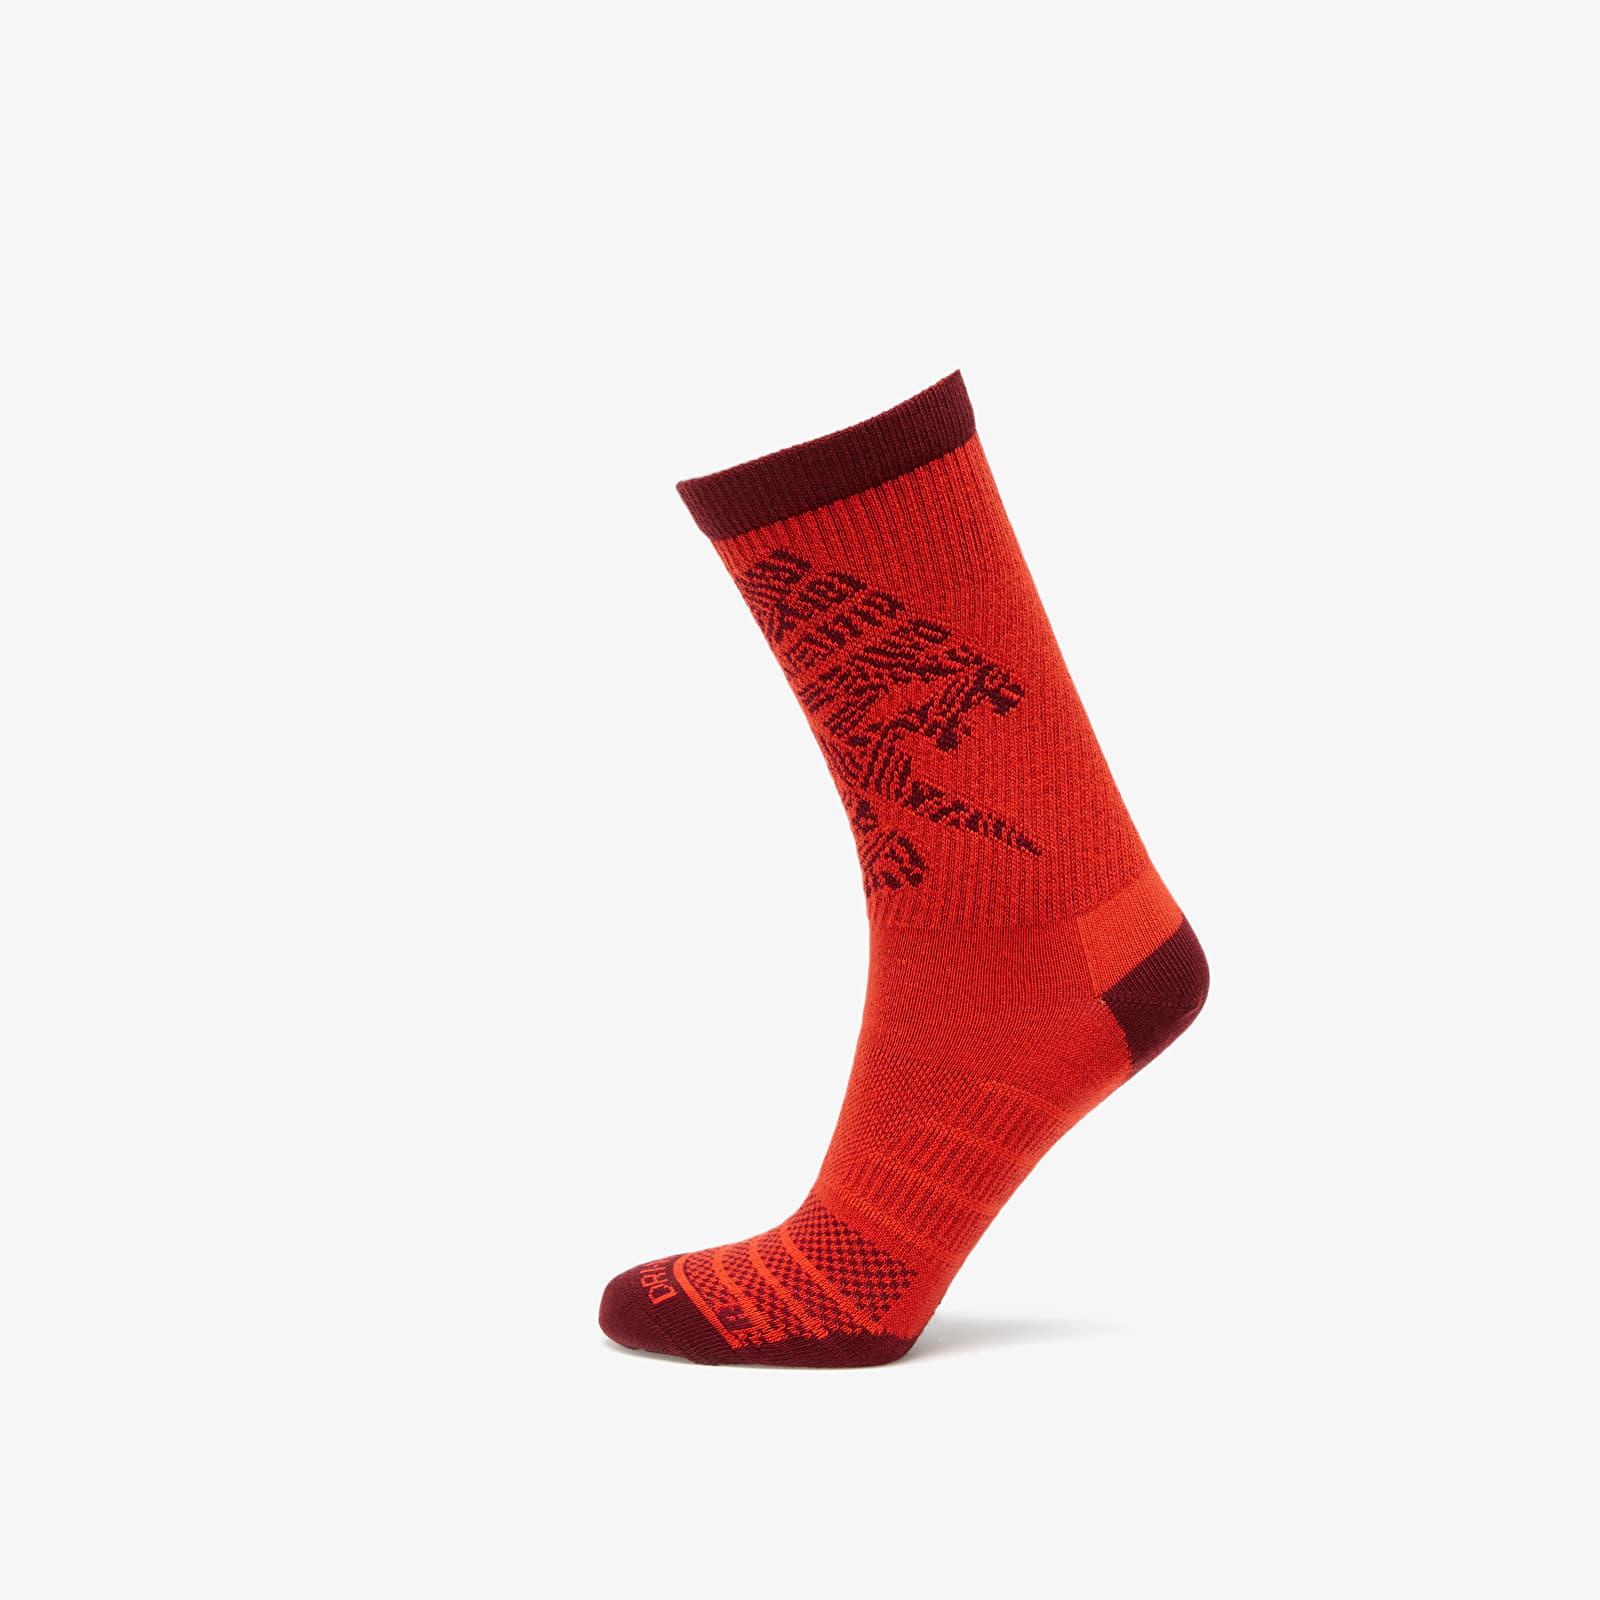 Zoknik Nike SB Everyday Max Lightweight Skate Crew Socks (3 Pairs) Multi-Color